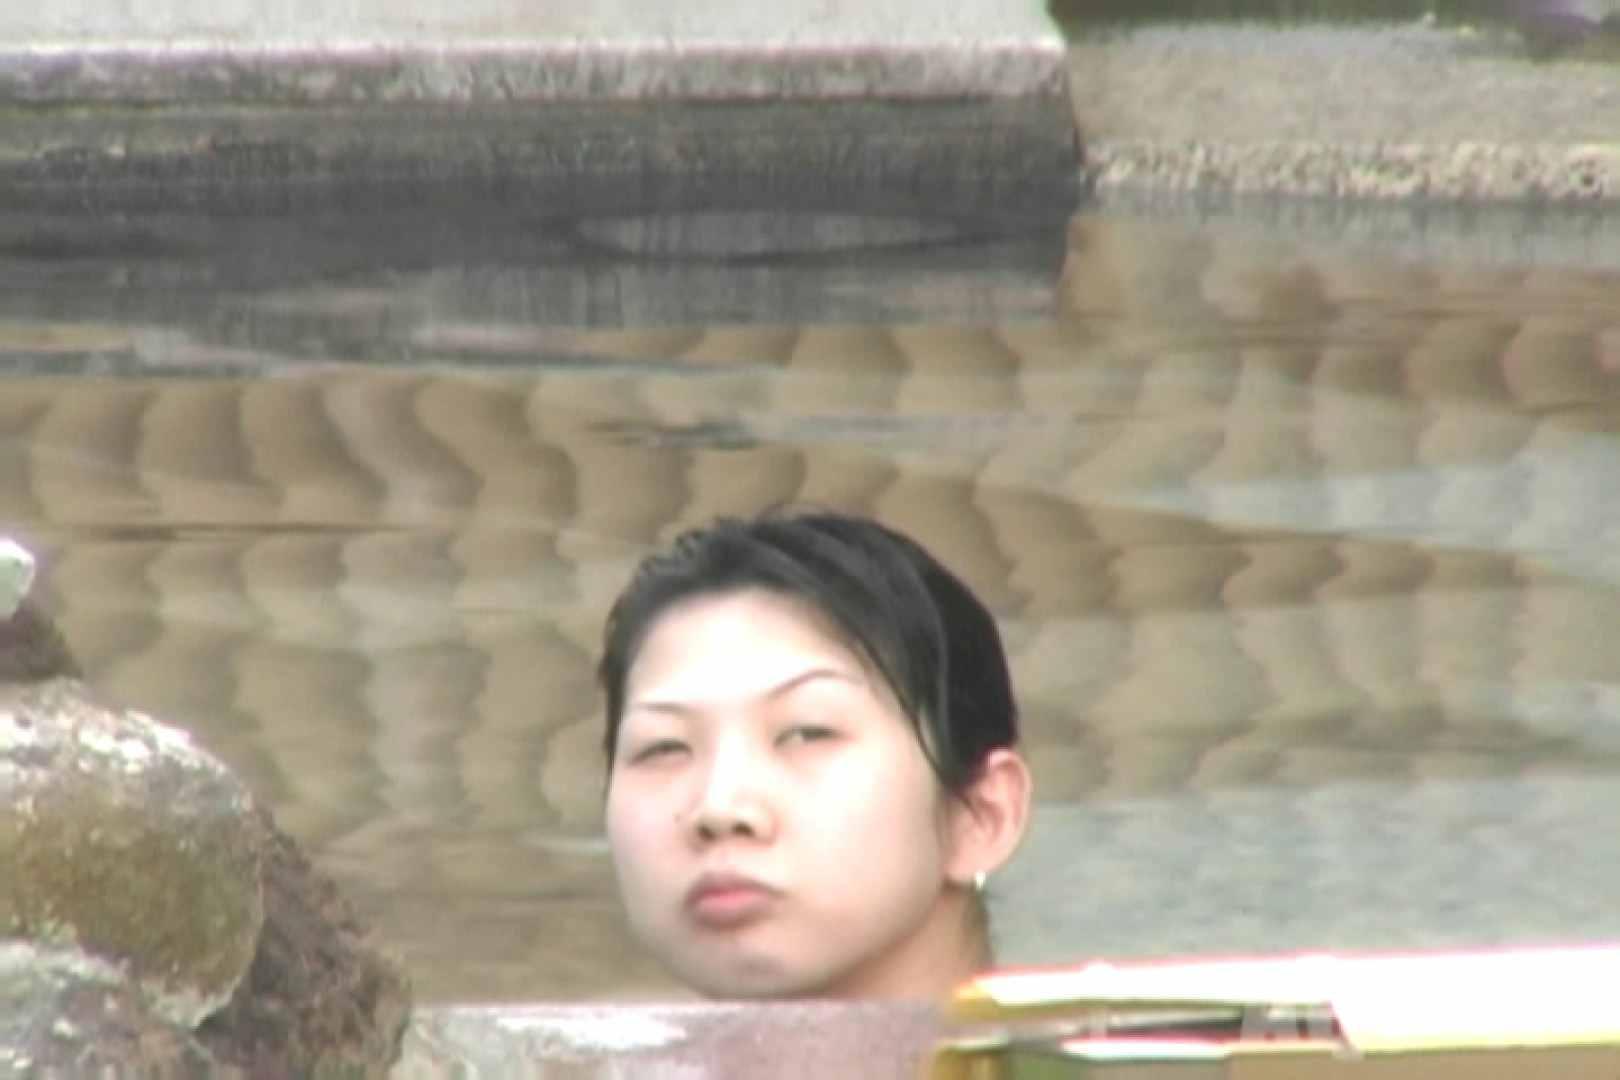 Aquaな露天風呂Vol.850 OLのエロ生活 | 露天風呂  76連発 58